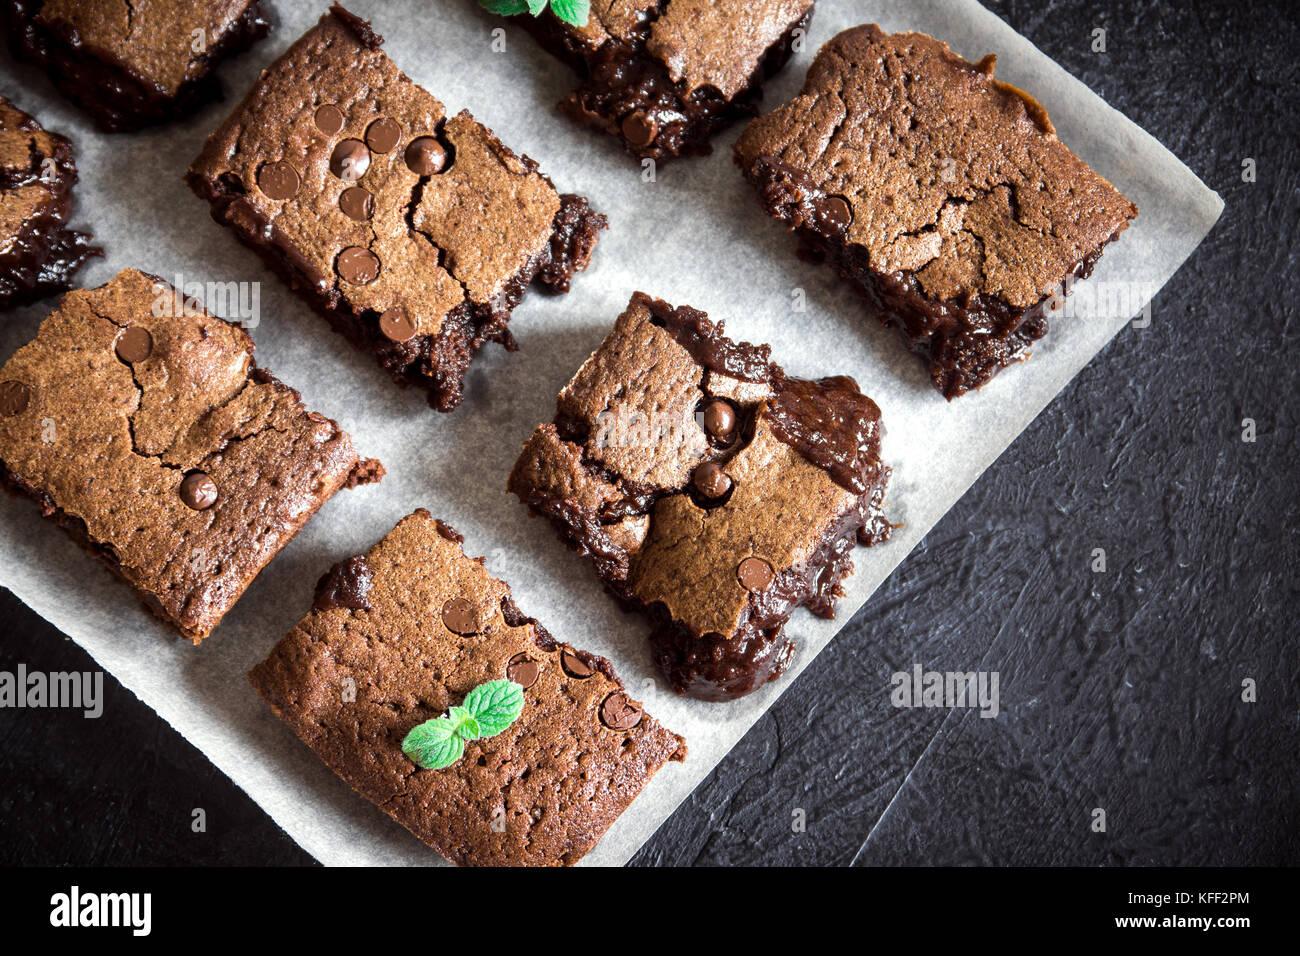 Brownies. Homemade chocolate fudge brownies on rustic black background, top view. - Stock Image